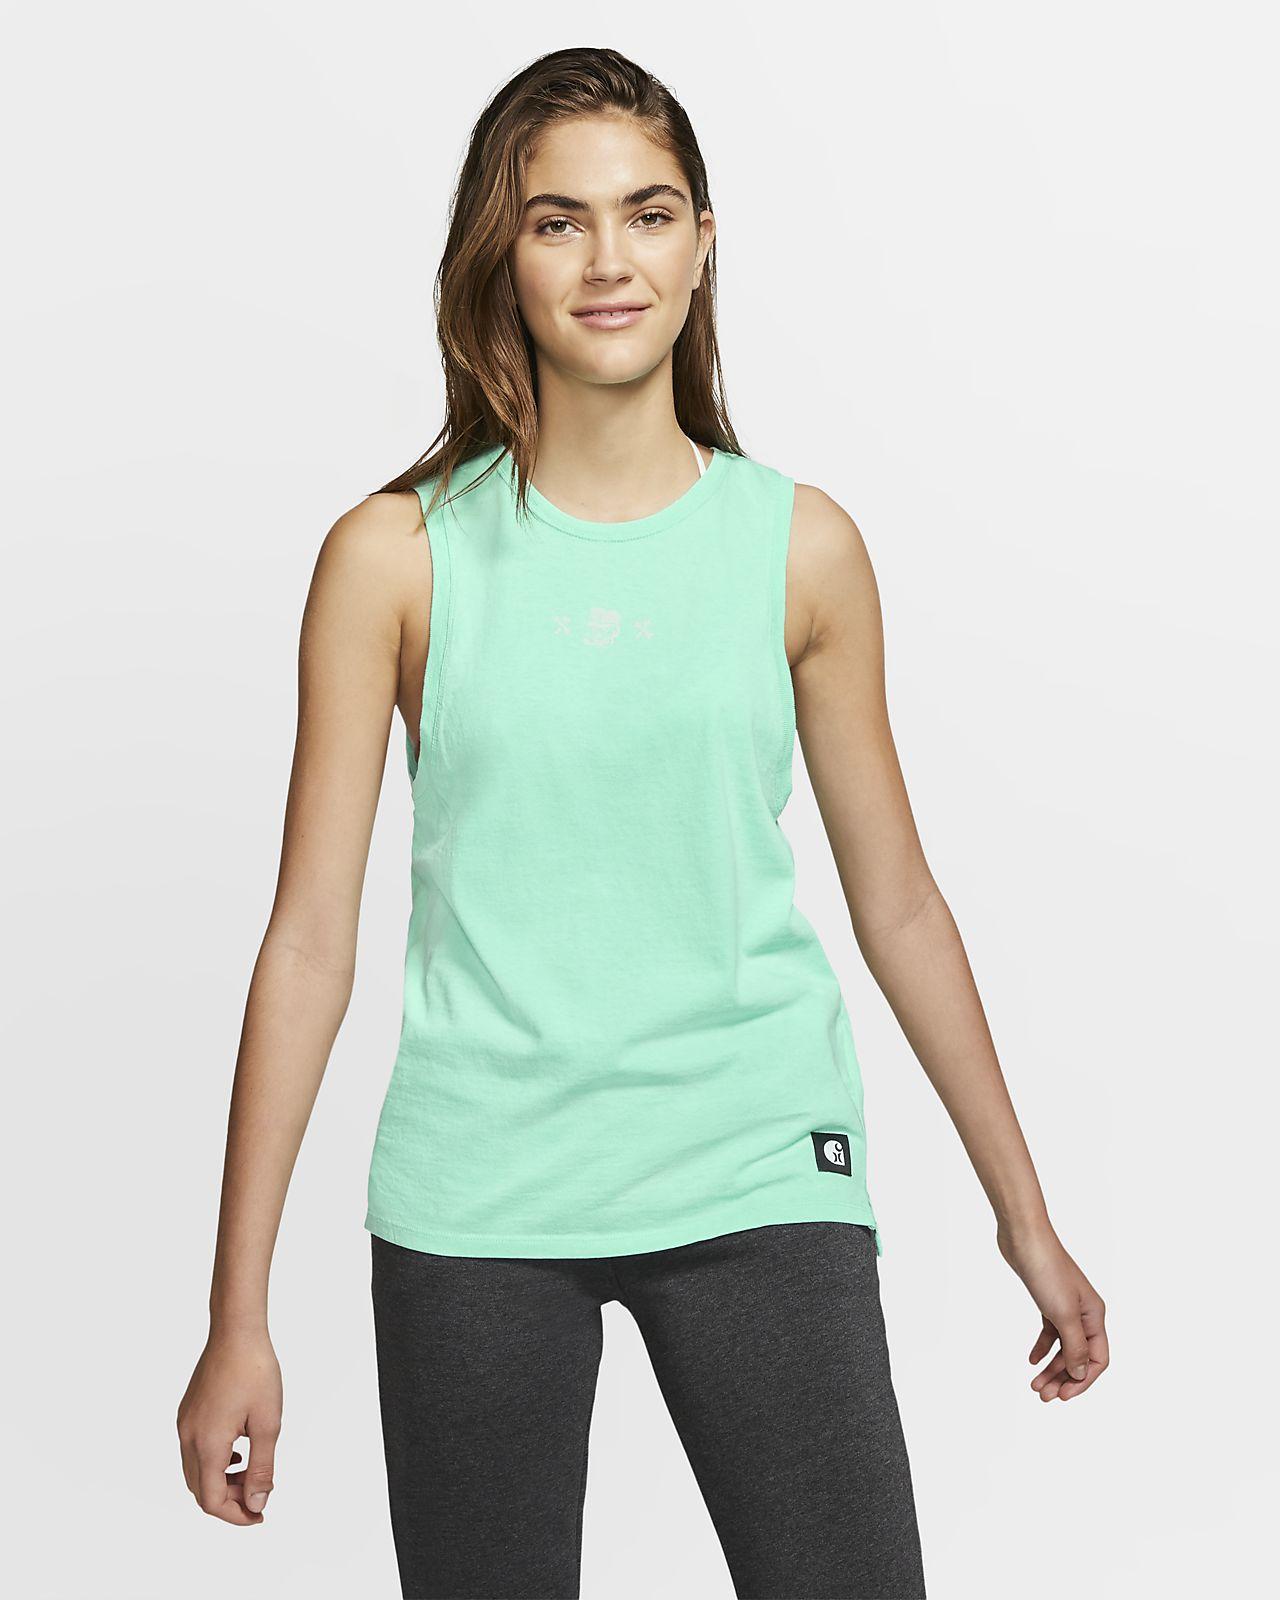 Camiseta de tirantes de ciclista para mujer Hurley x Carhartt